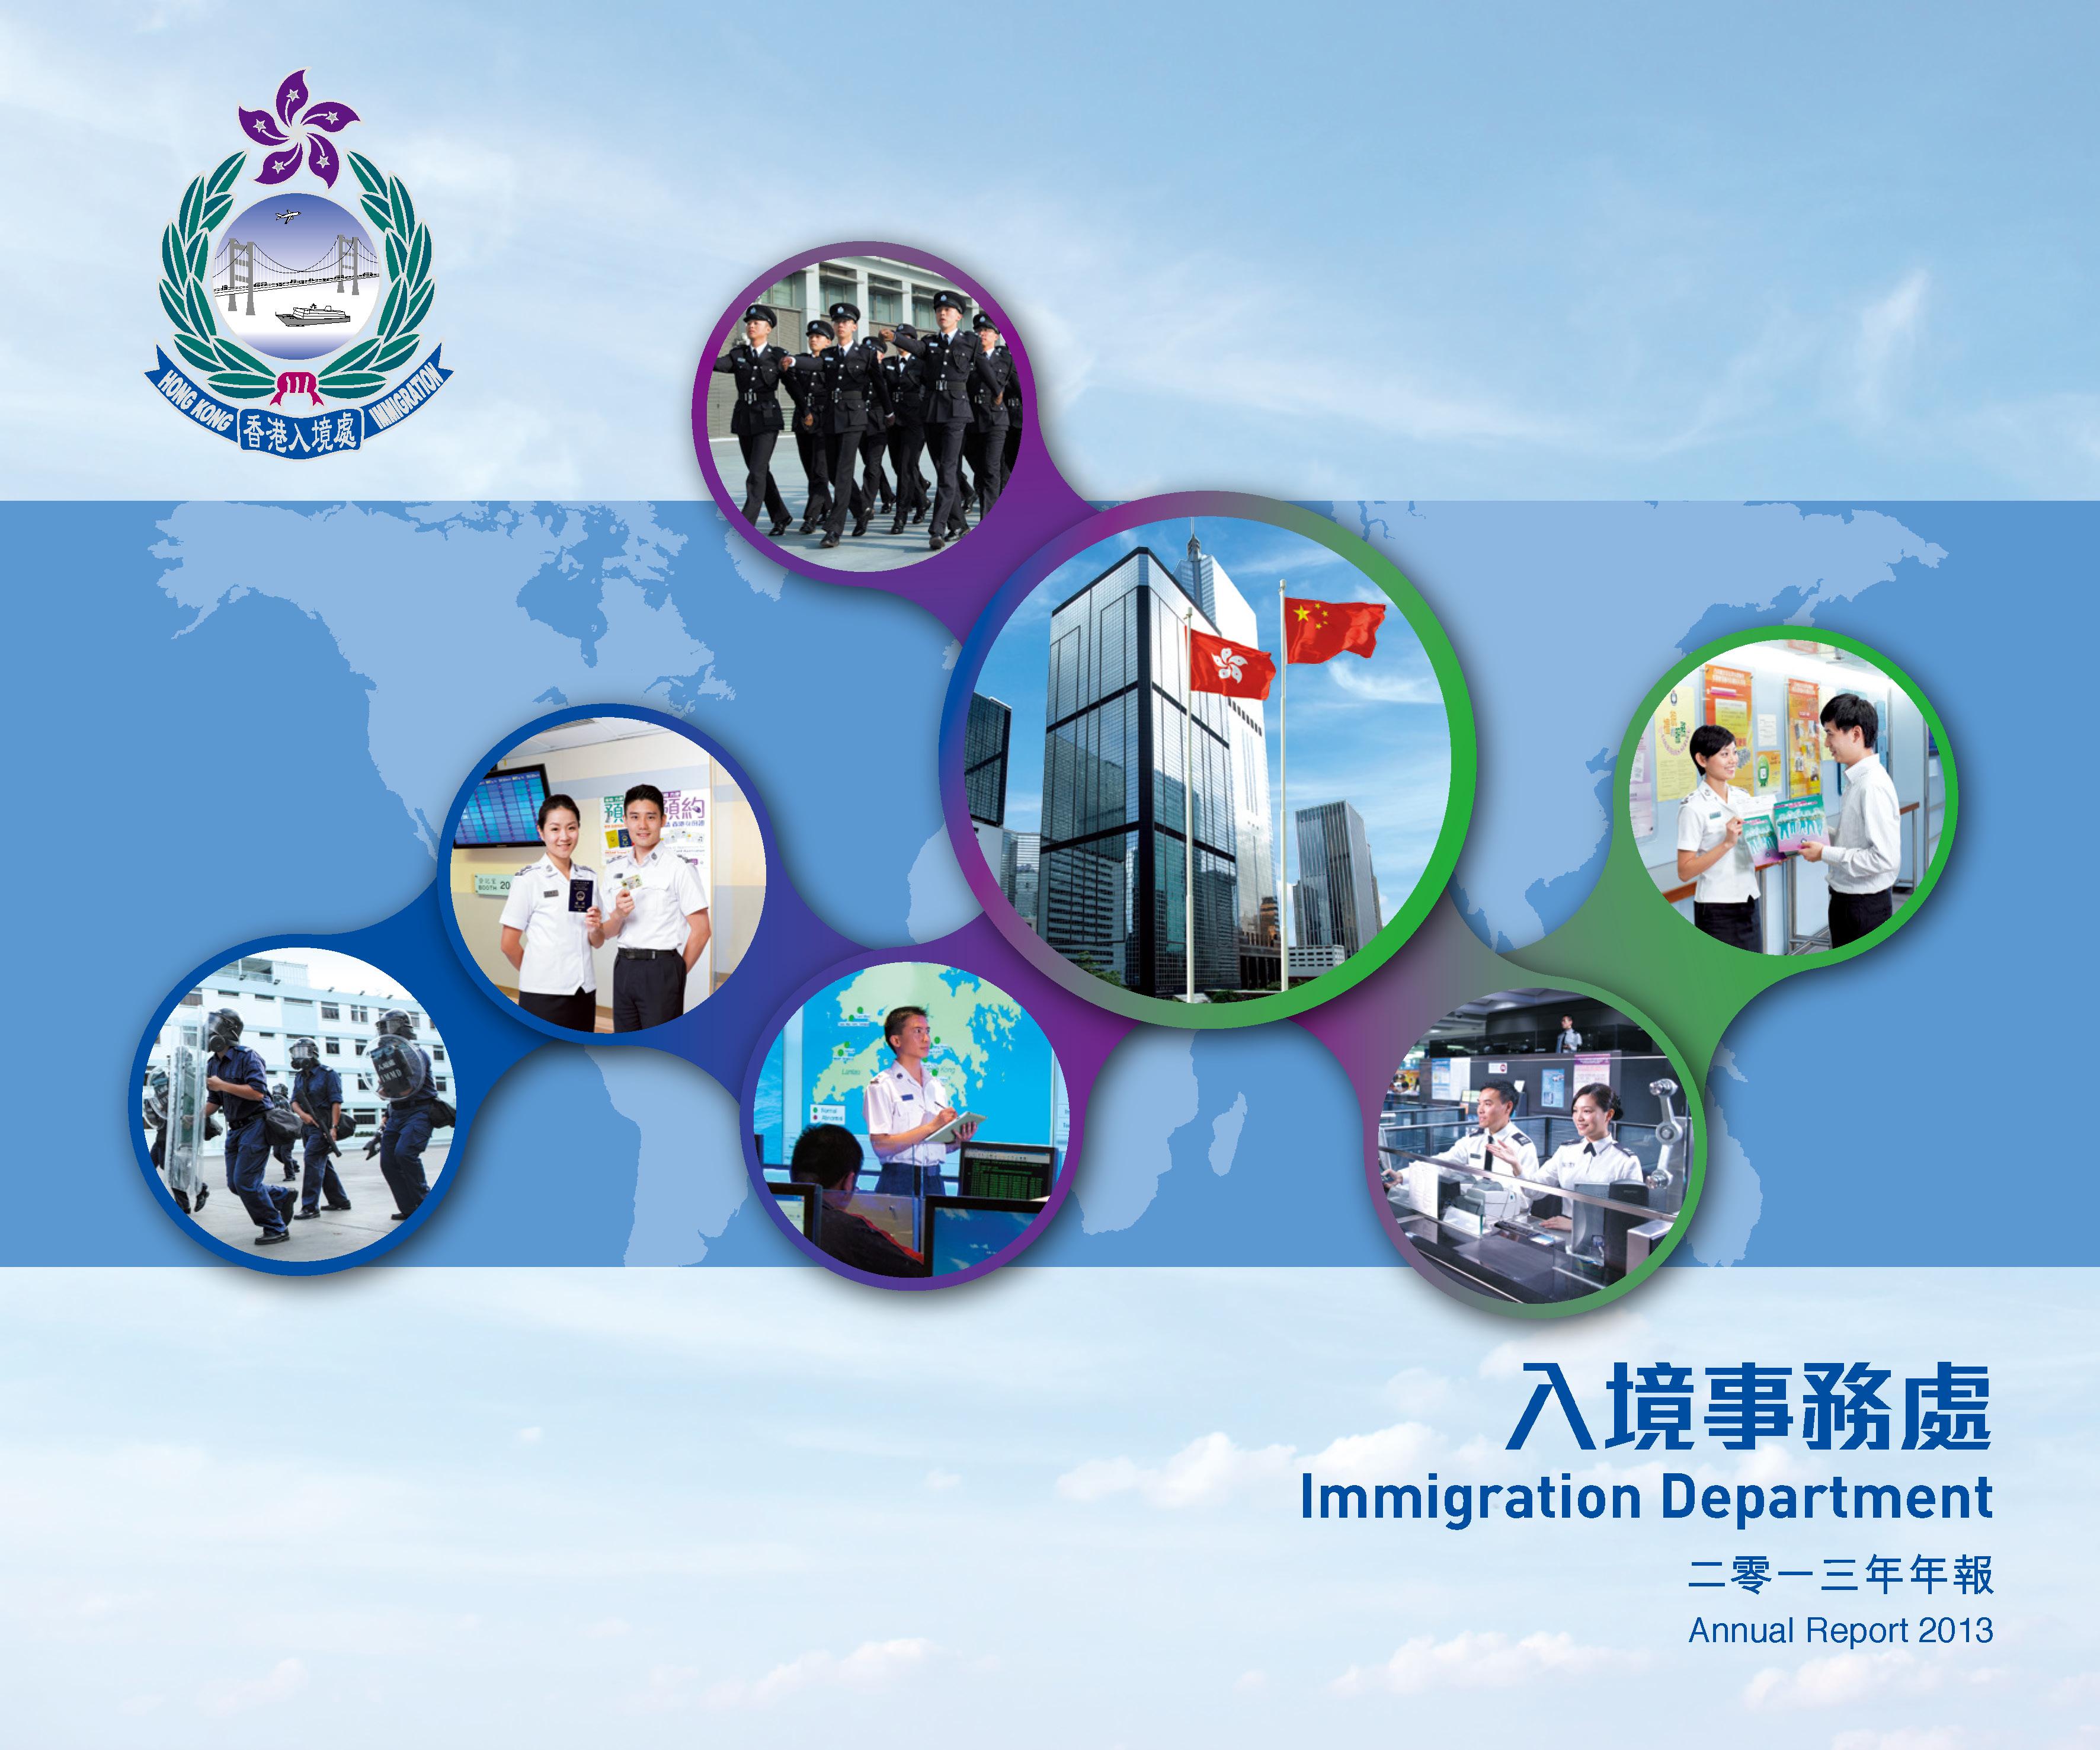 Hong kong disneyland annual report 2006 toyota